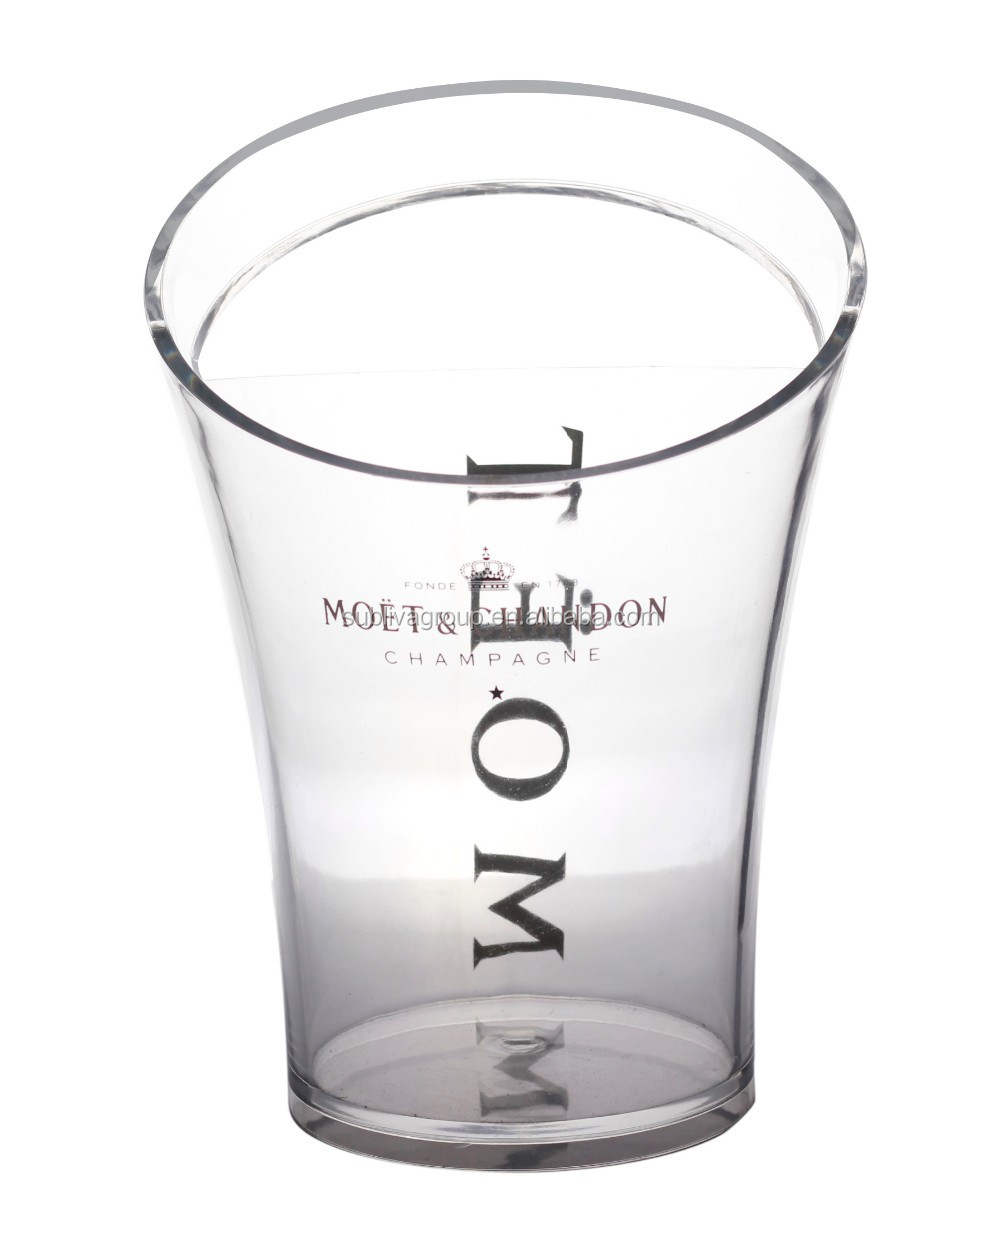 3 5l Slanted Mouth Acrylic Ice Bucket Plastic Wine Cooler Buy Acrylic Ice Bucket Plastic Wine Cooler 3 5l Slanted Mouth Ice Bucket Product On Alibaba Com